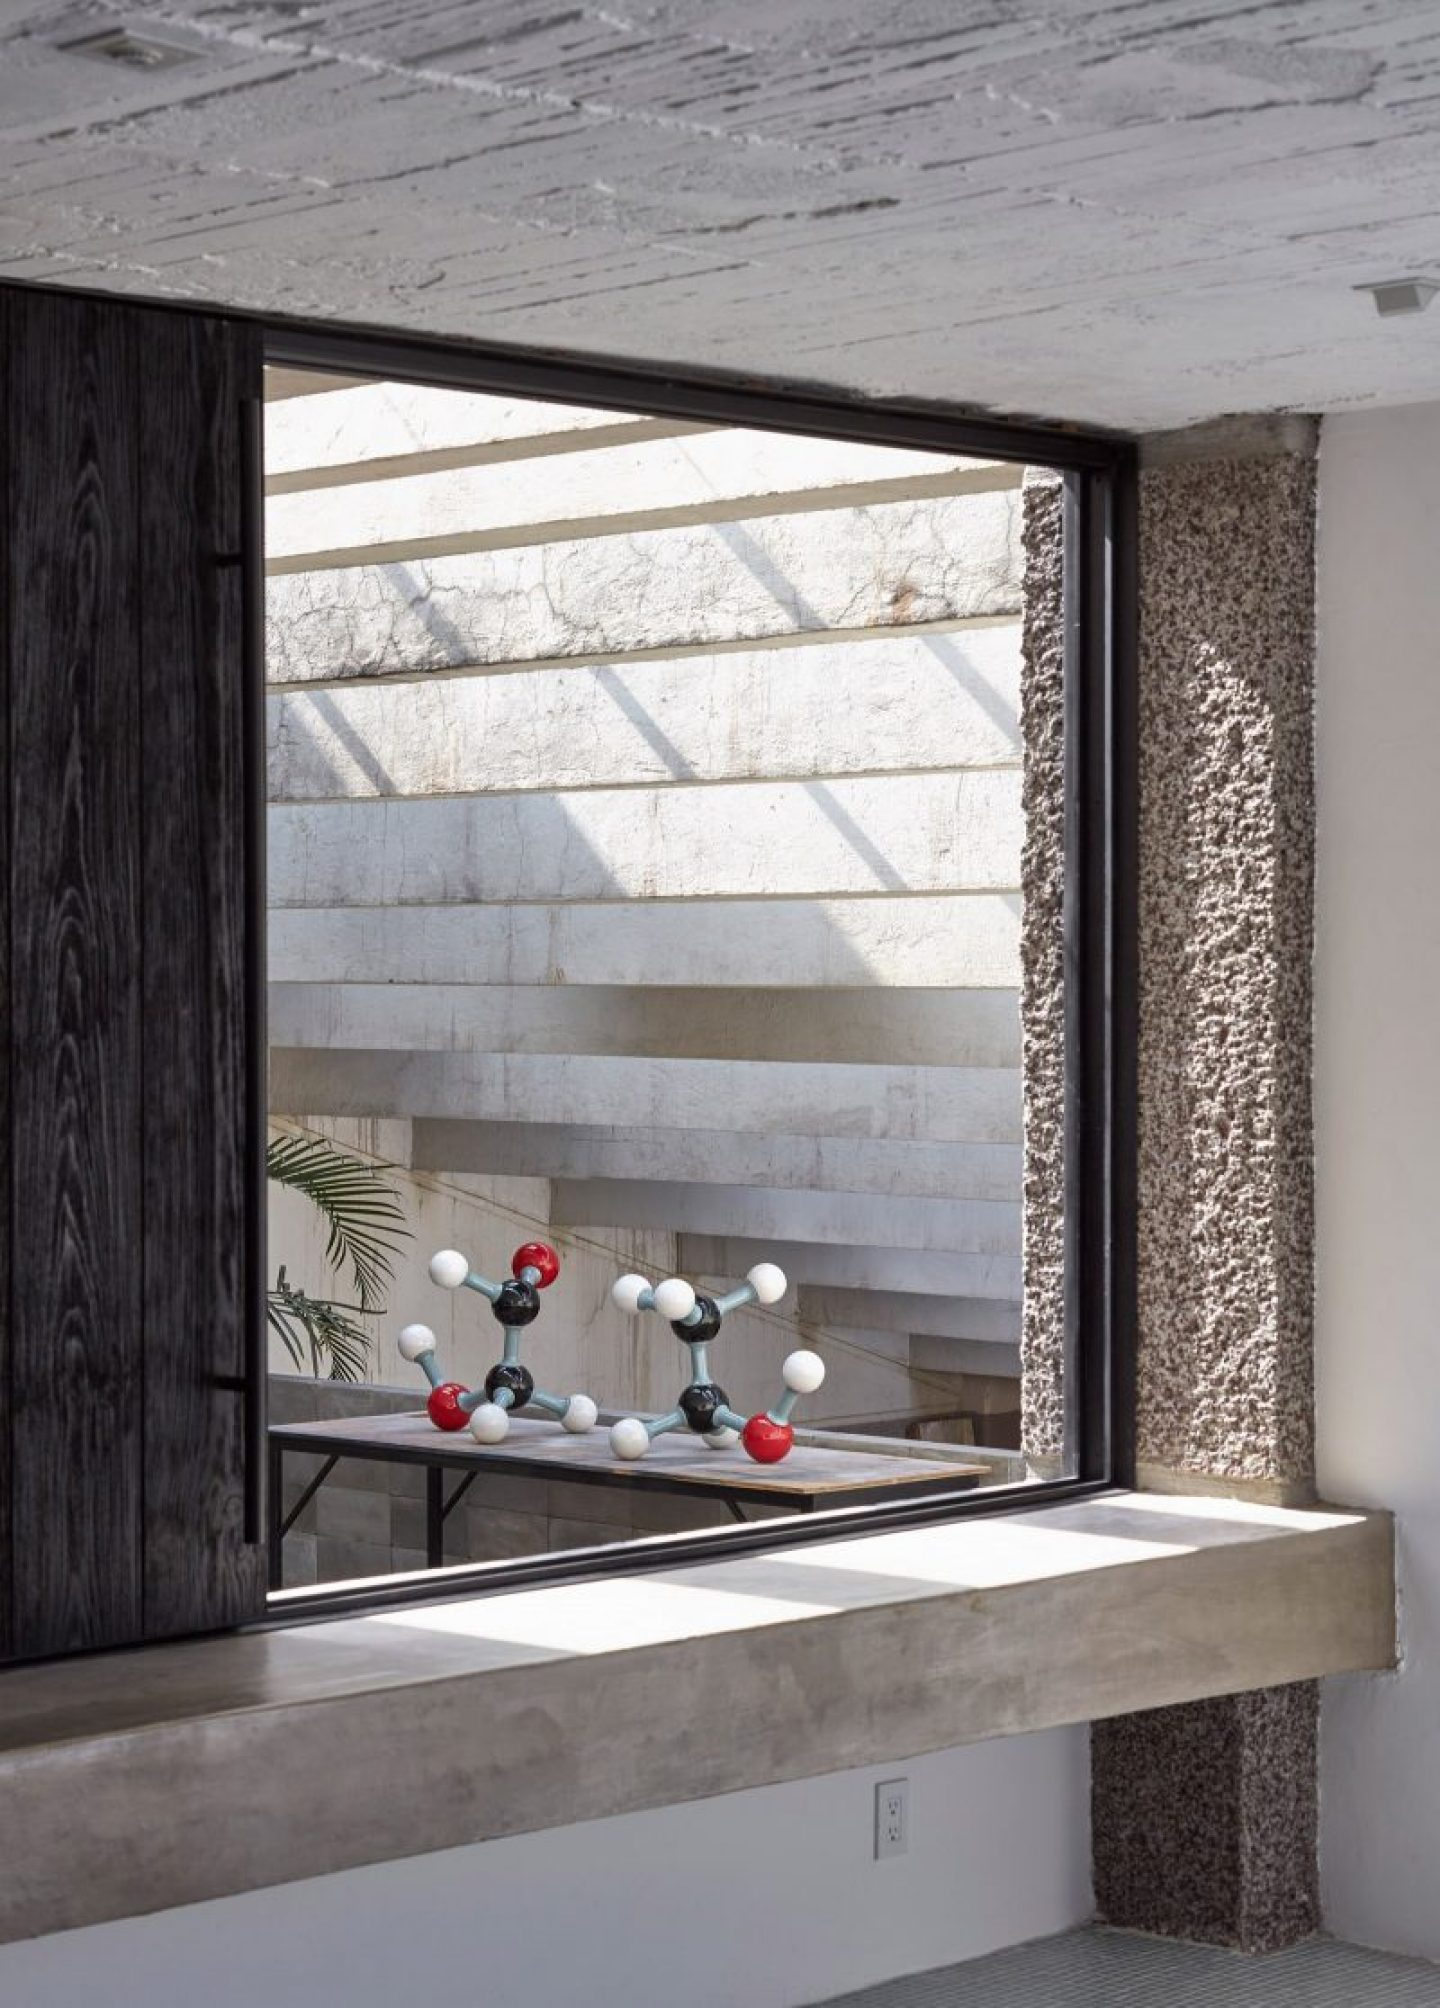 Pedro_Reyes_Architecture (13)